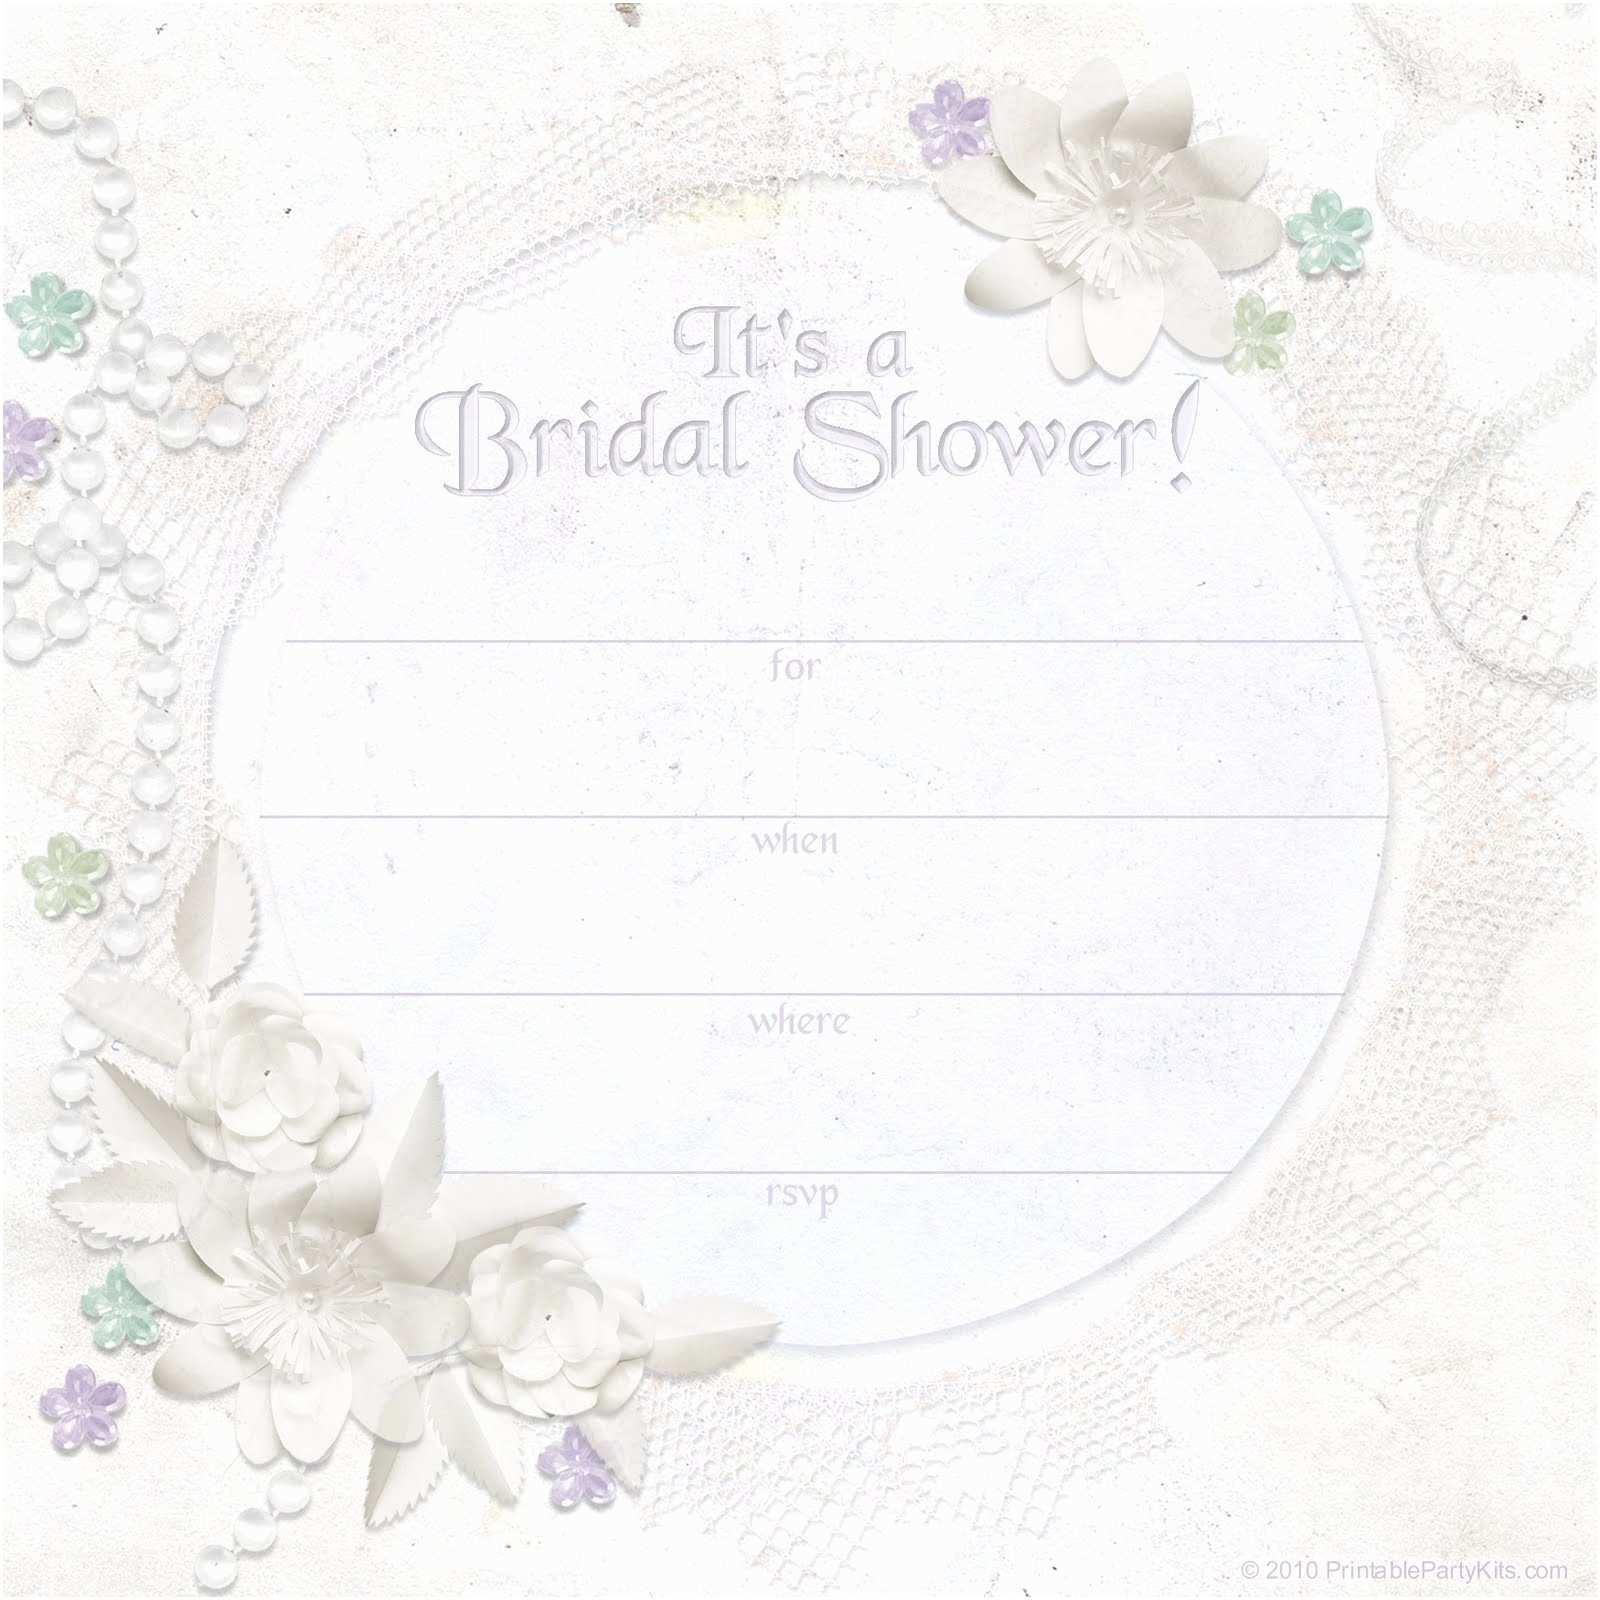 Printable Wedding Shower Invitations Bridal Shower Invitation Templates